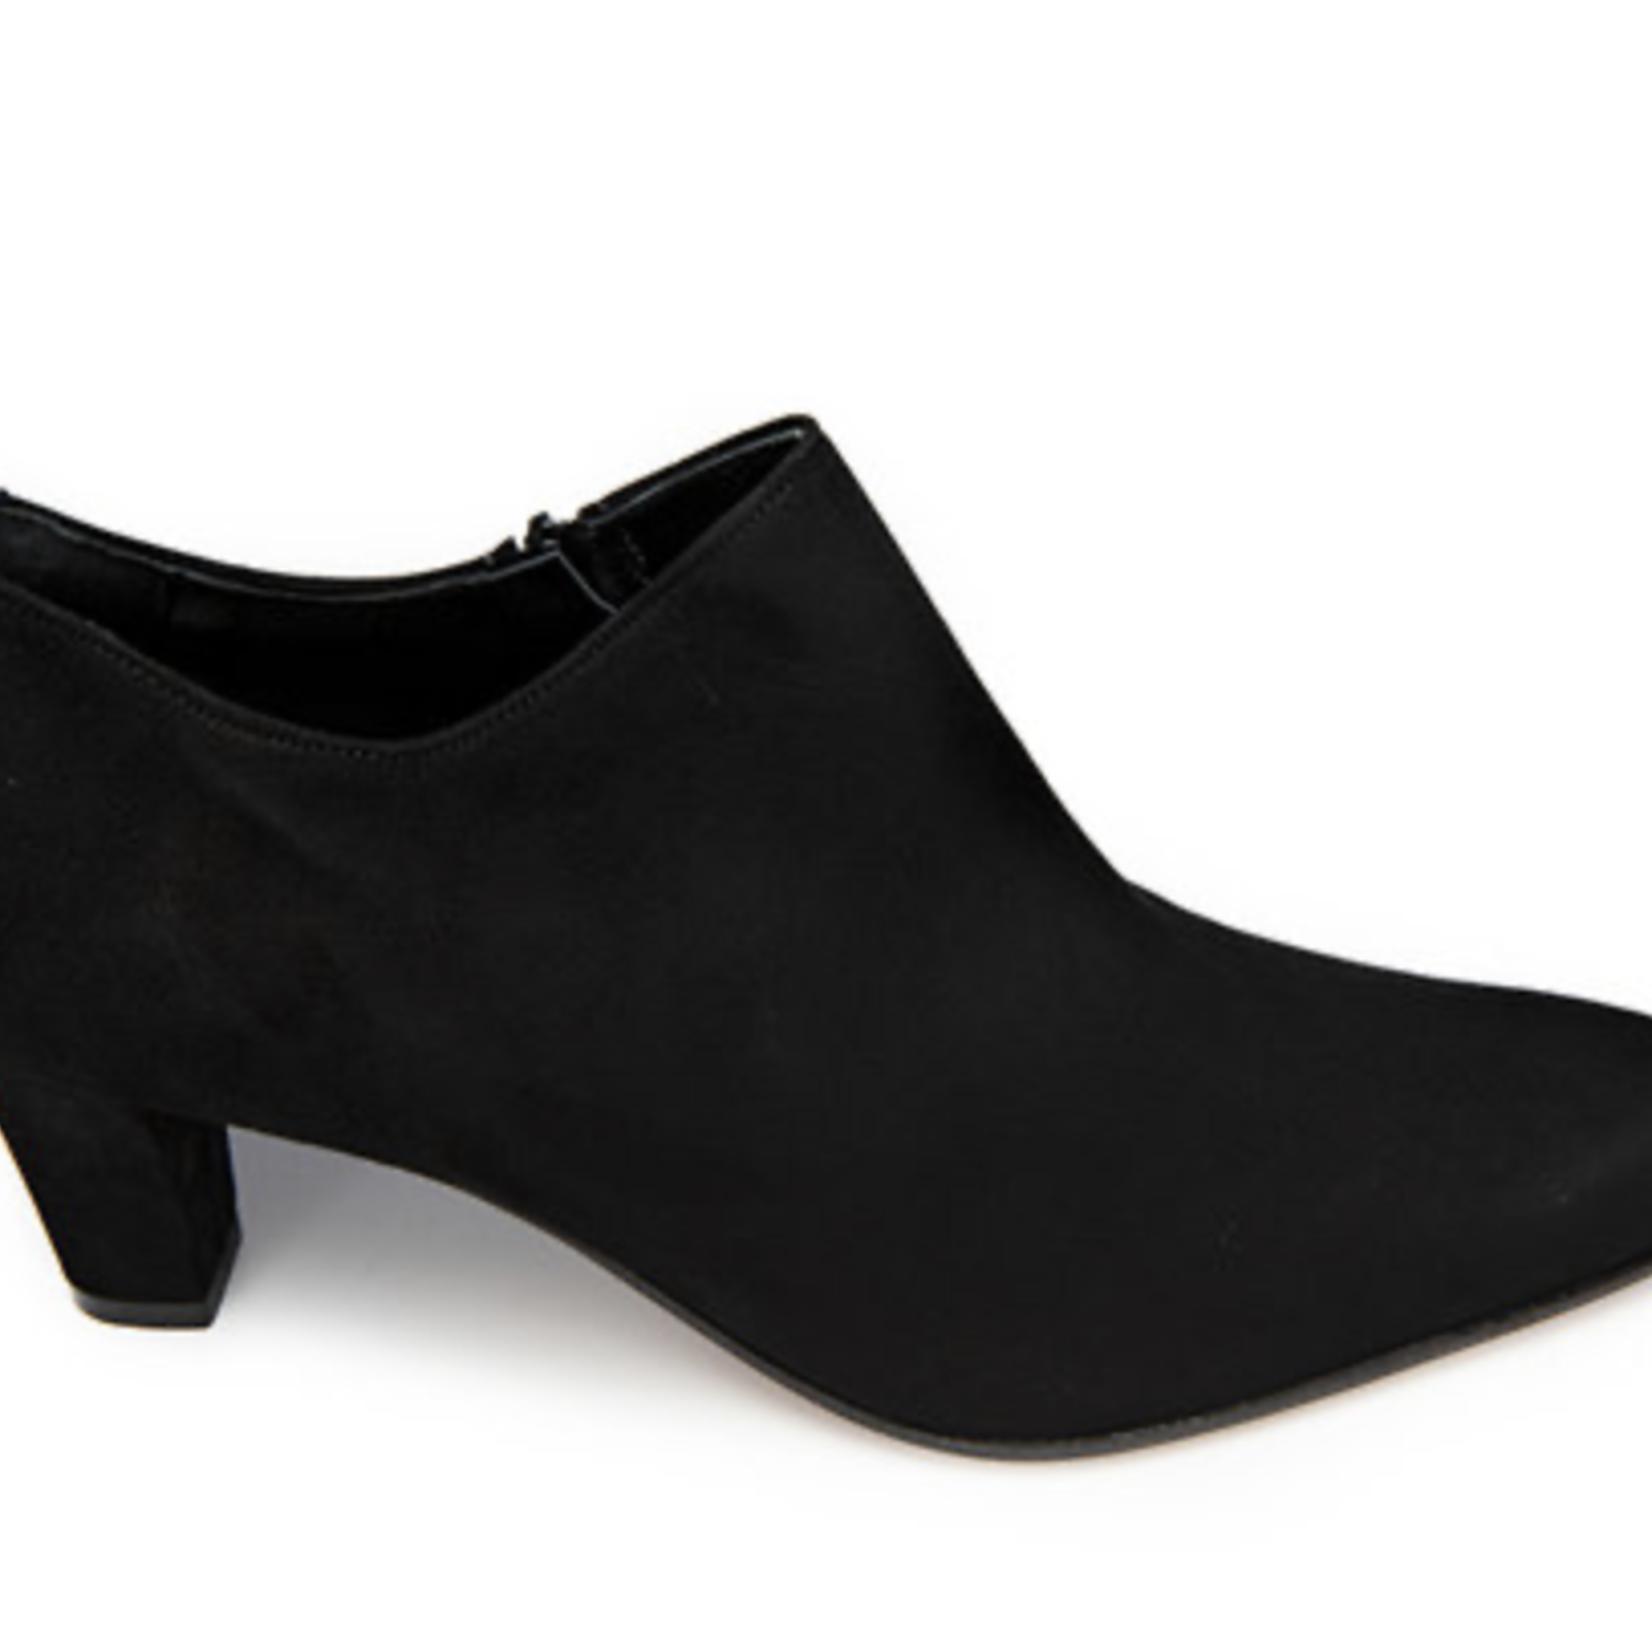 Panara Short Boot